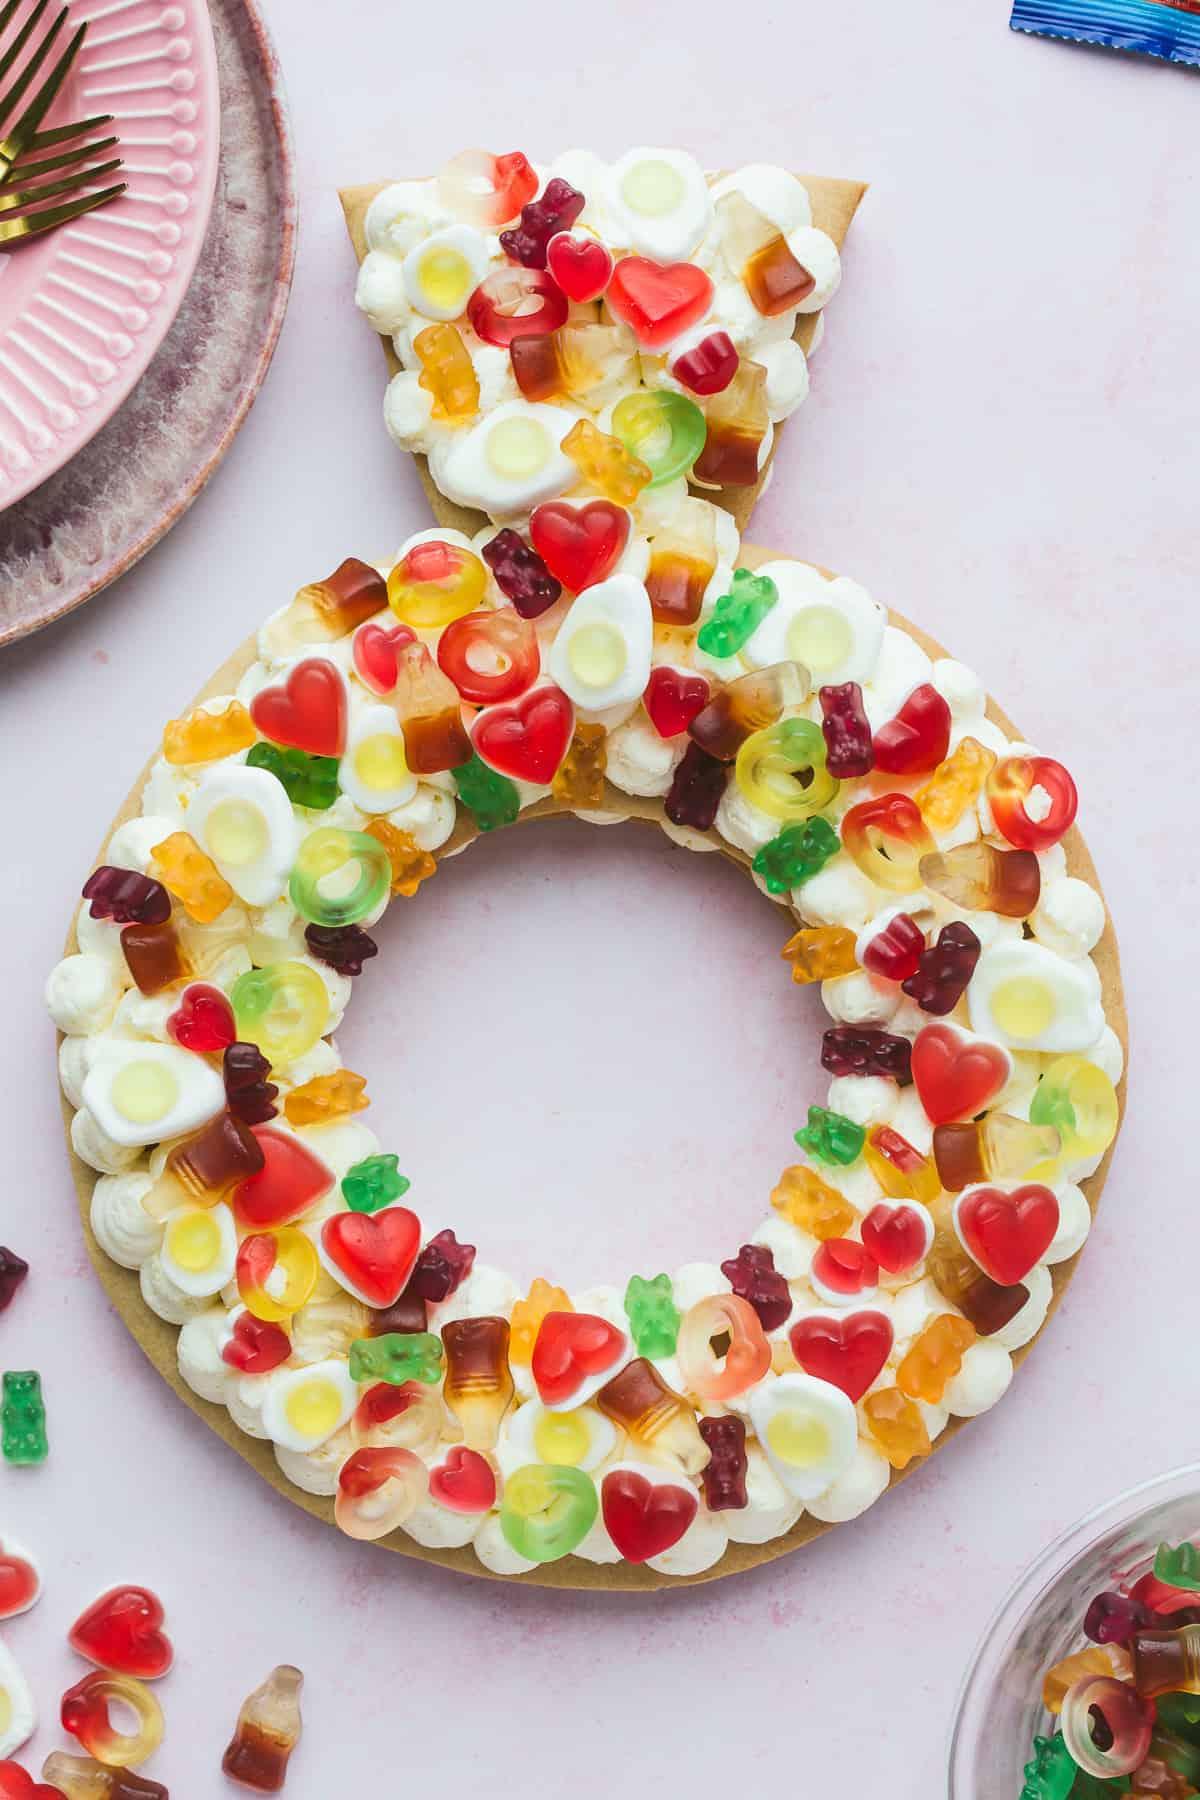 Ring shape cream tart with HARIBO sweets.